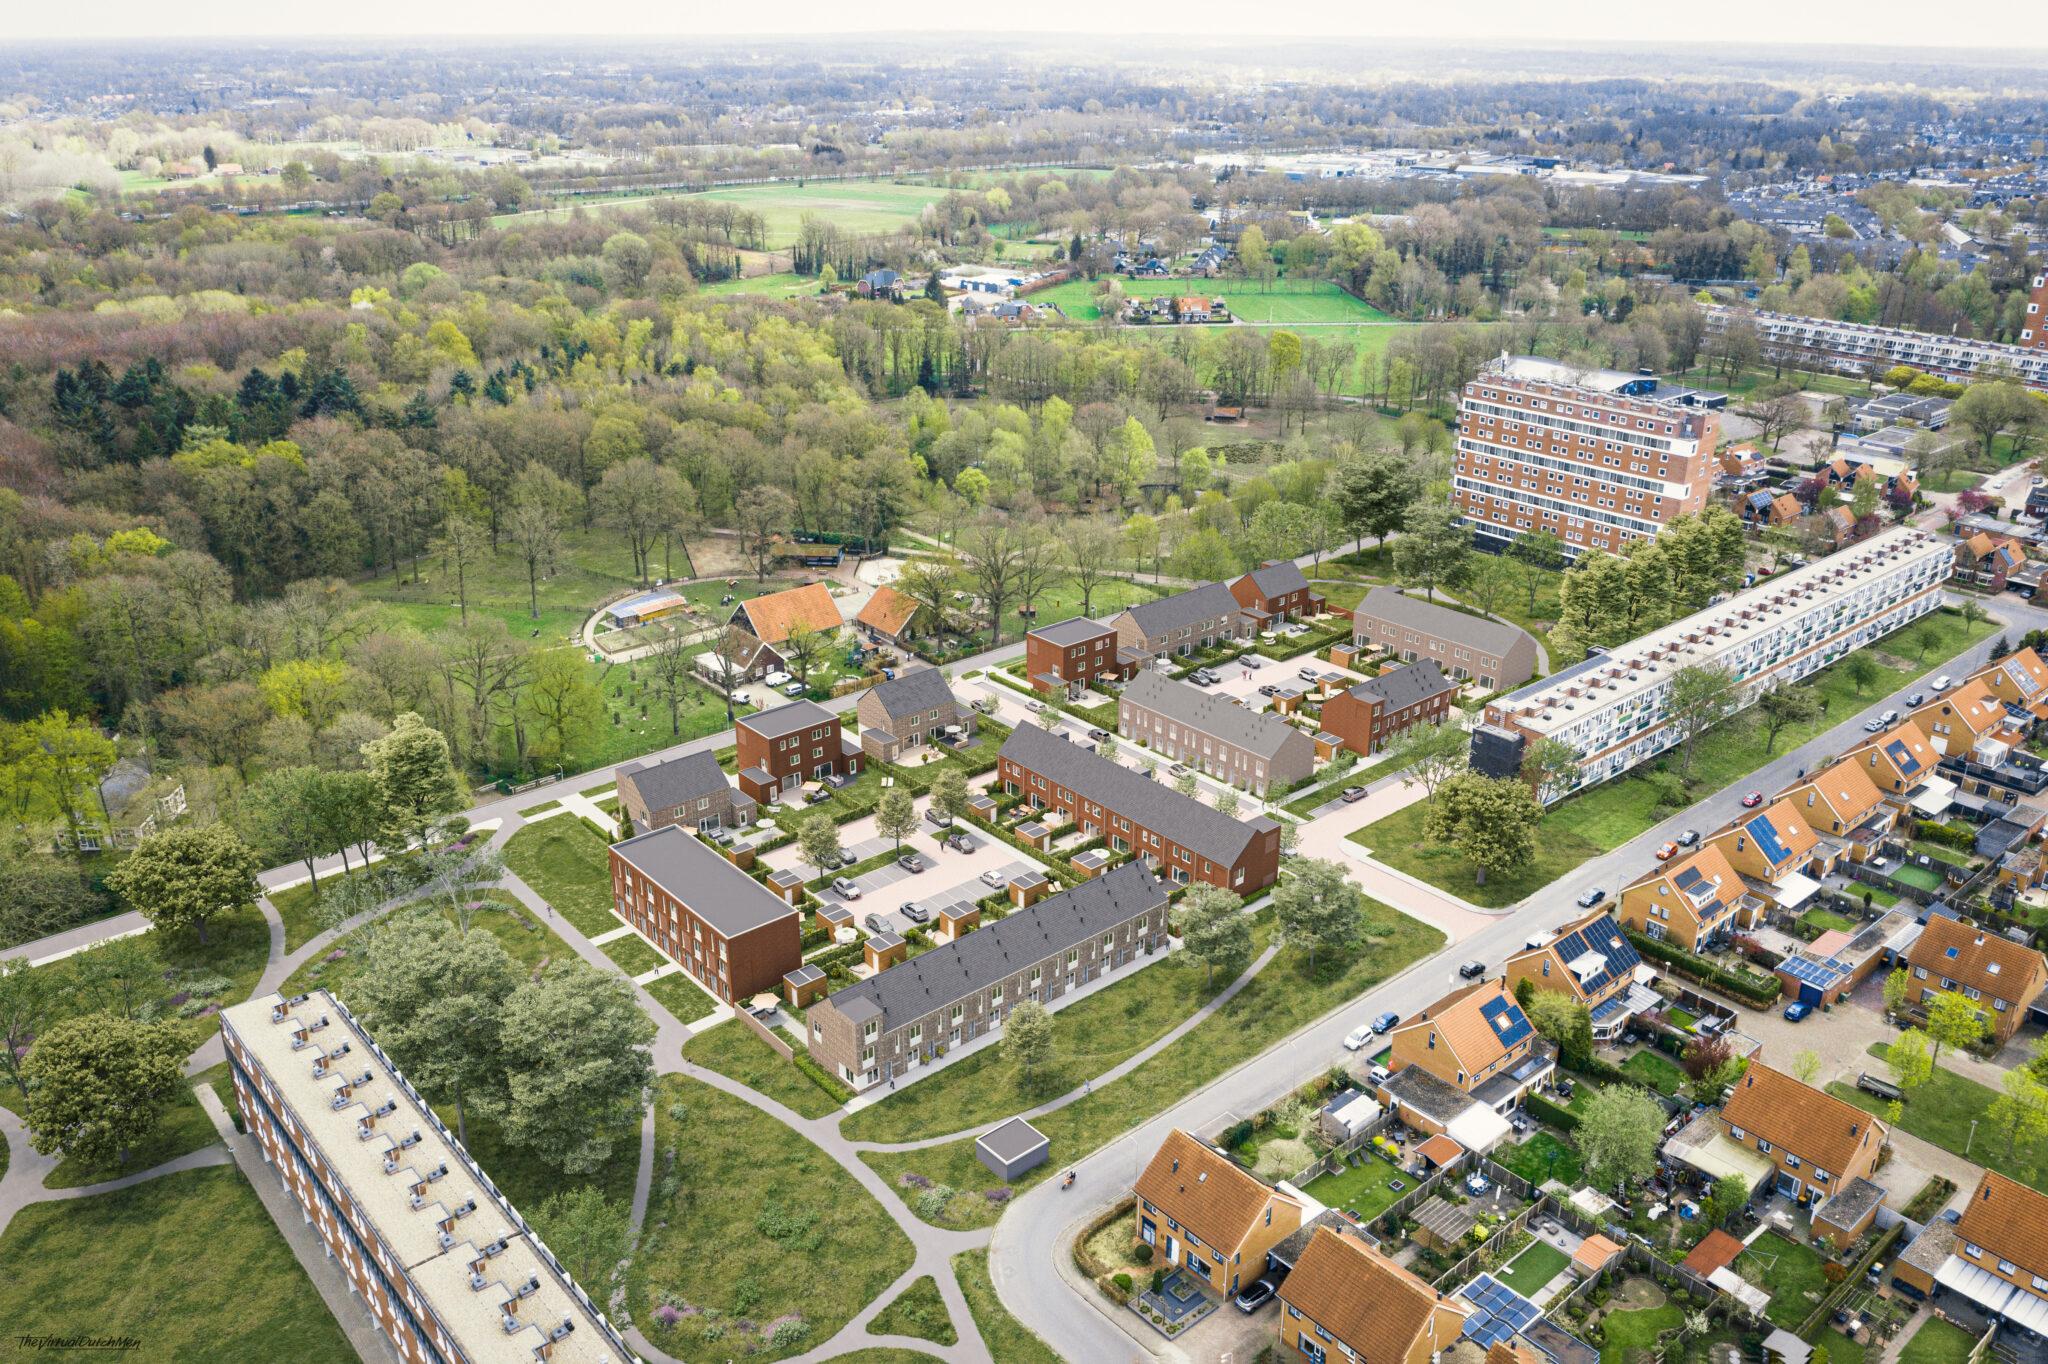 Nieuwe Es Hengelo - Vogelvlucht - yoreM Digital in Real Estate